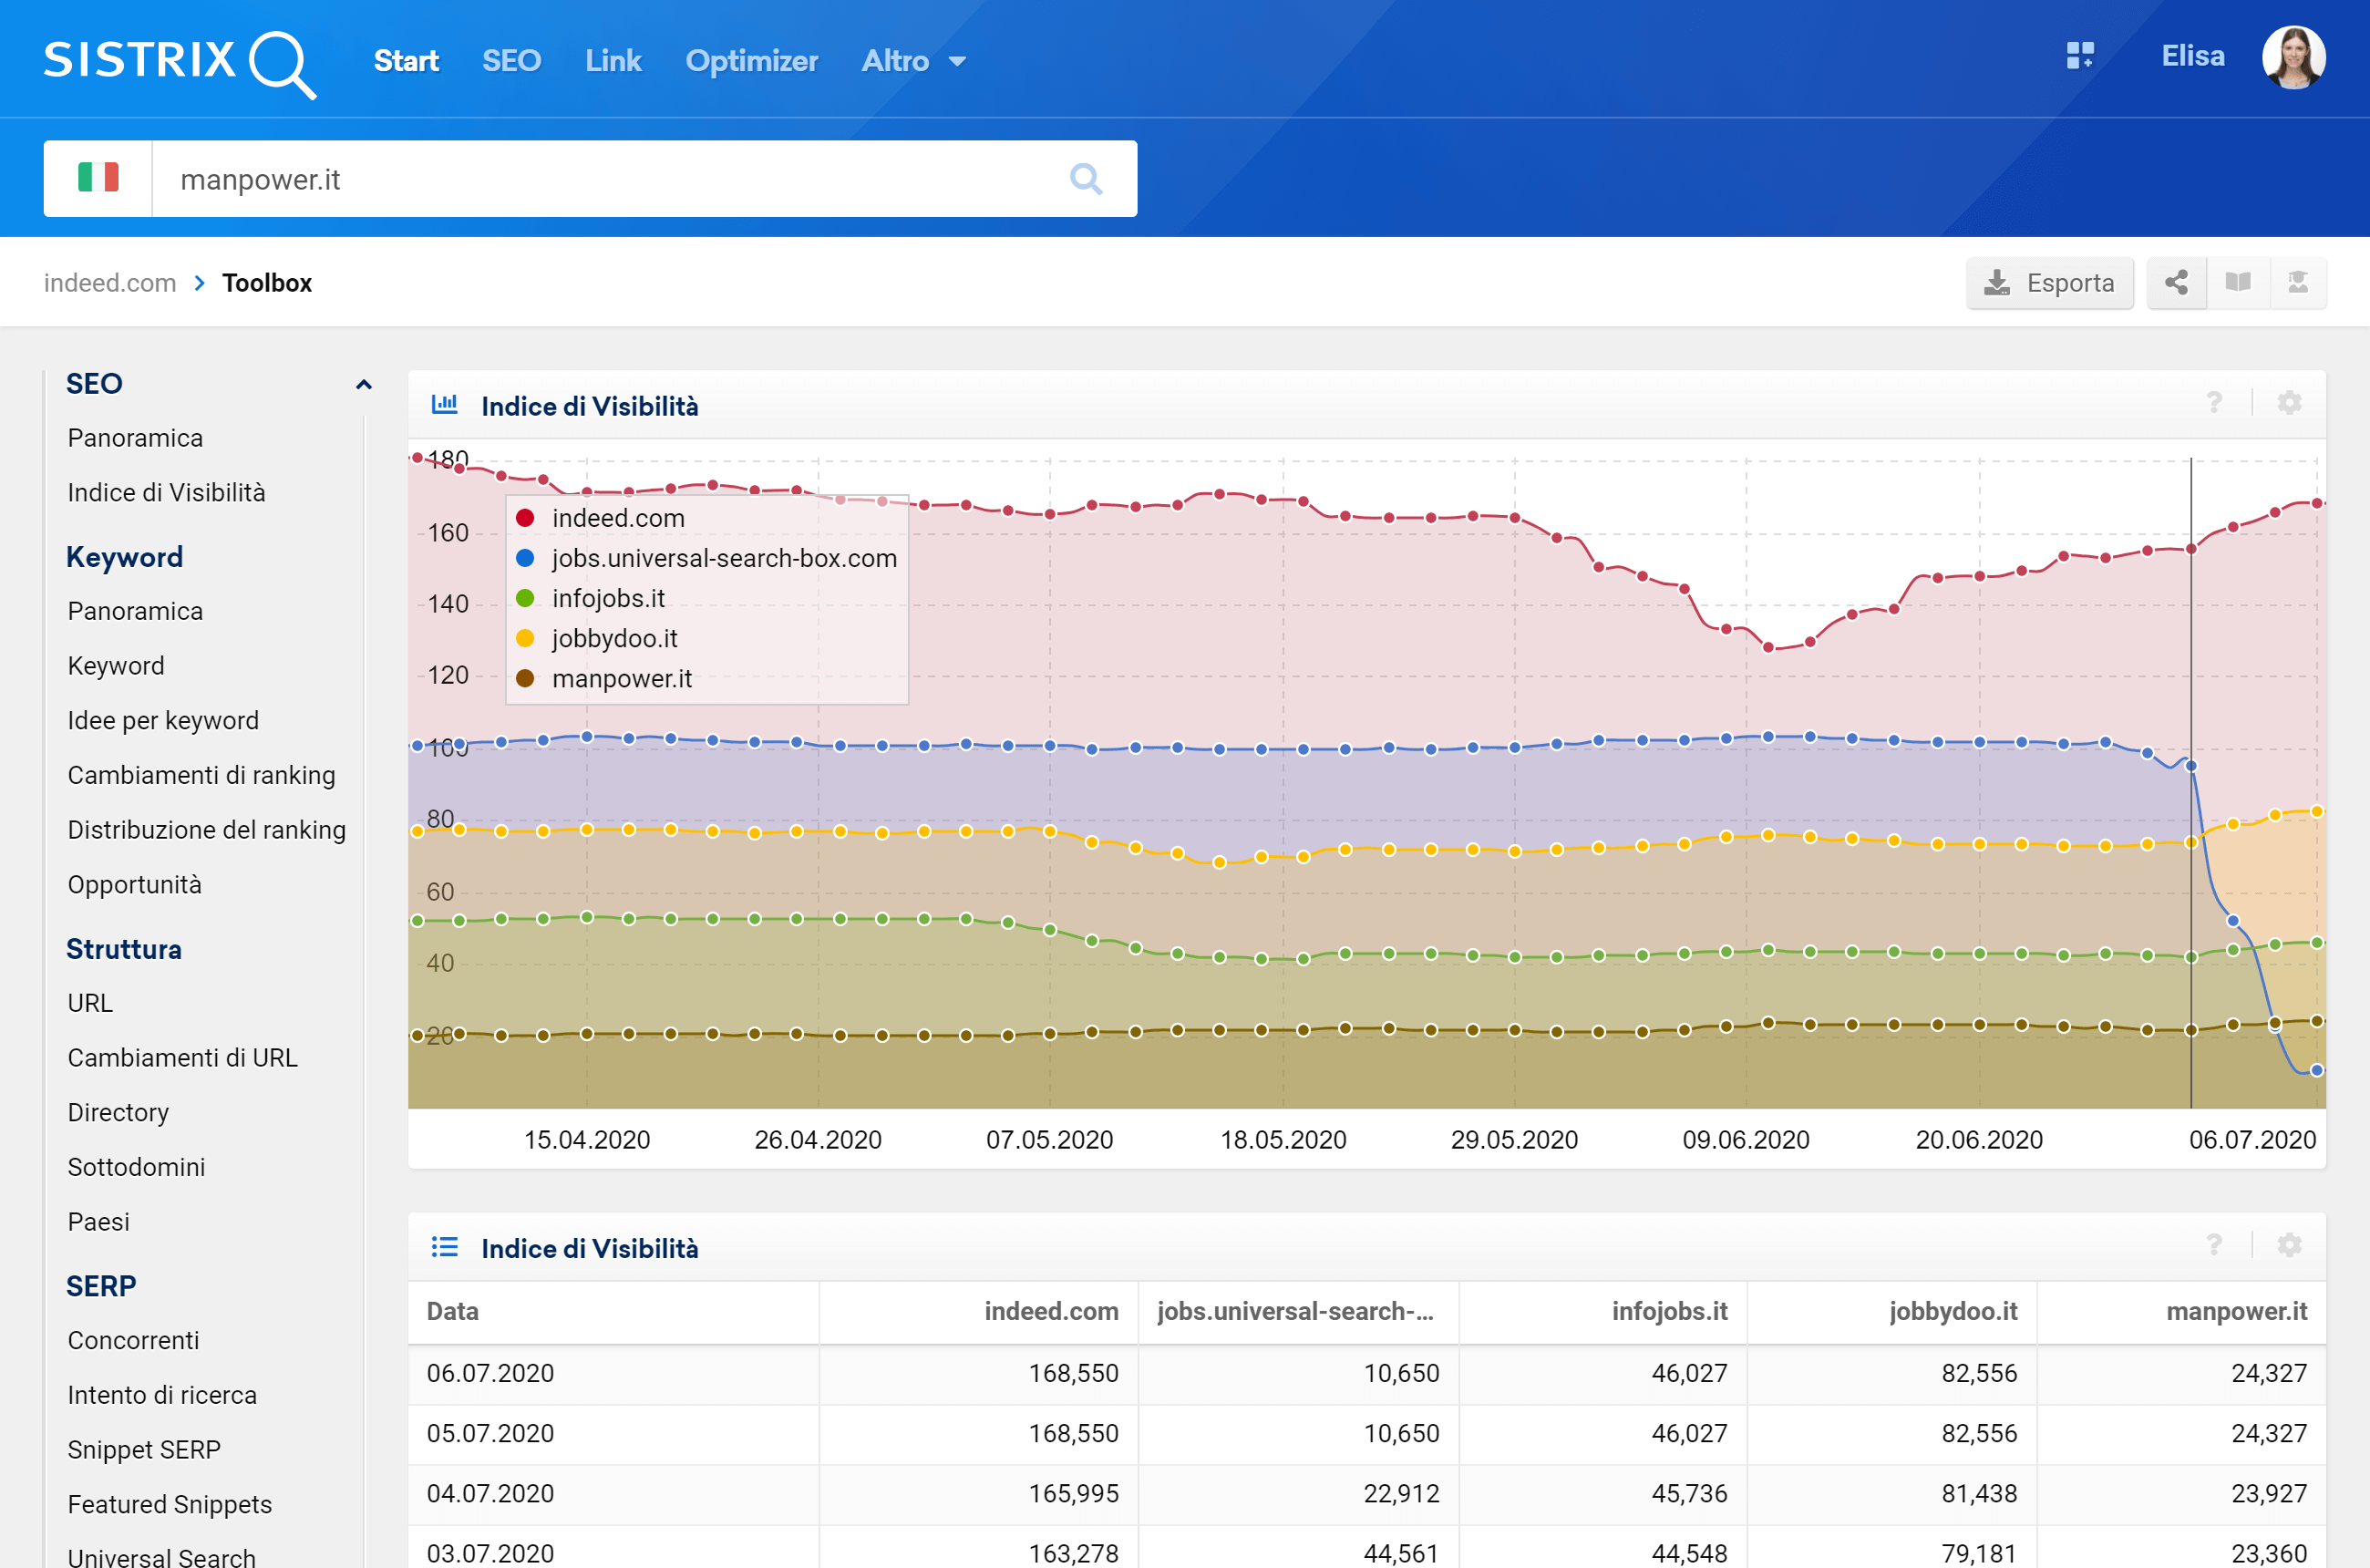 Confronto tra gli Indici di Visibilità di indeed.com, infojobs.it, jobbydoo.it, manpower.it e Google Jobs (desktop)